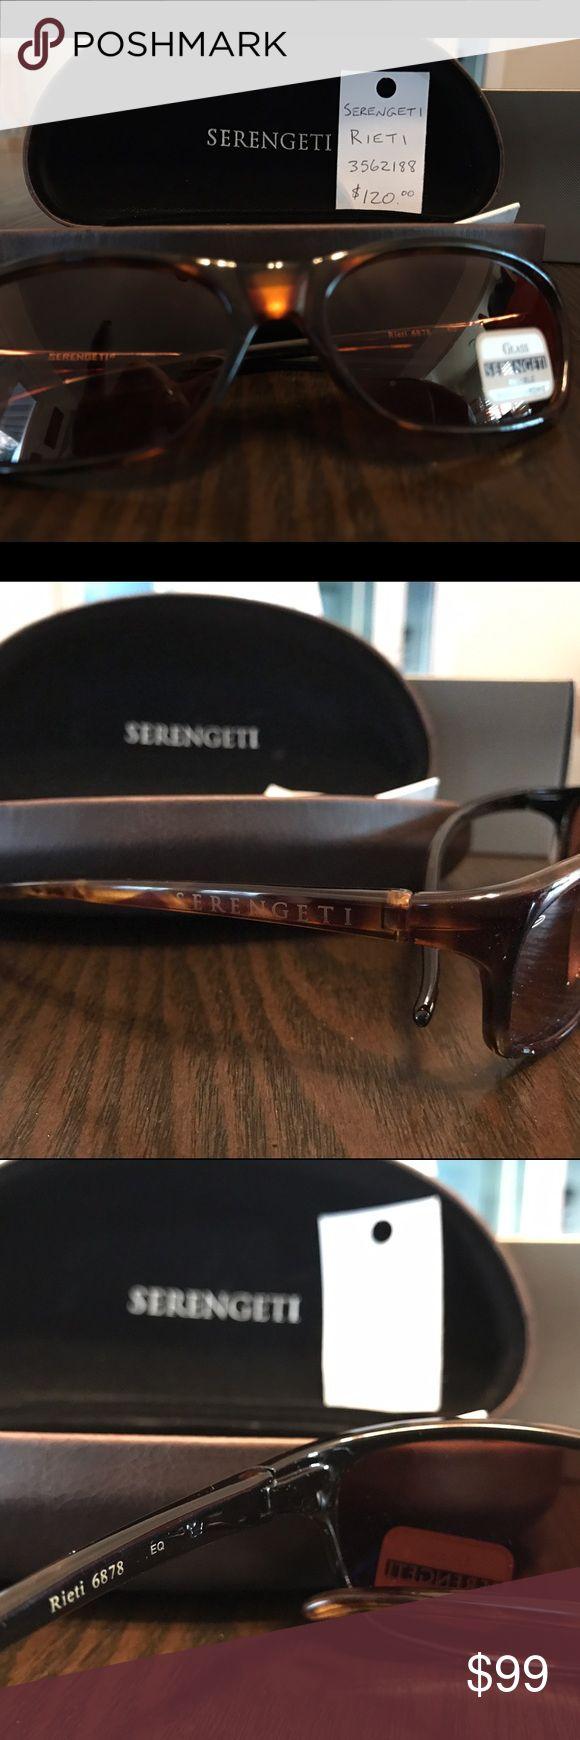 New Serengeti sunglasses unisex brown New Serengeti sunglasses unisex brown comes with hard case slight scratches on case original price 120 serengeti Accessories Glasses